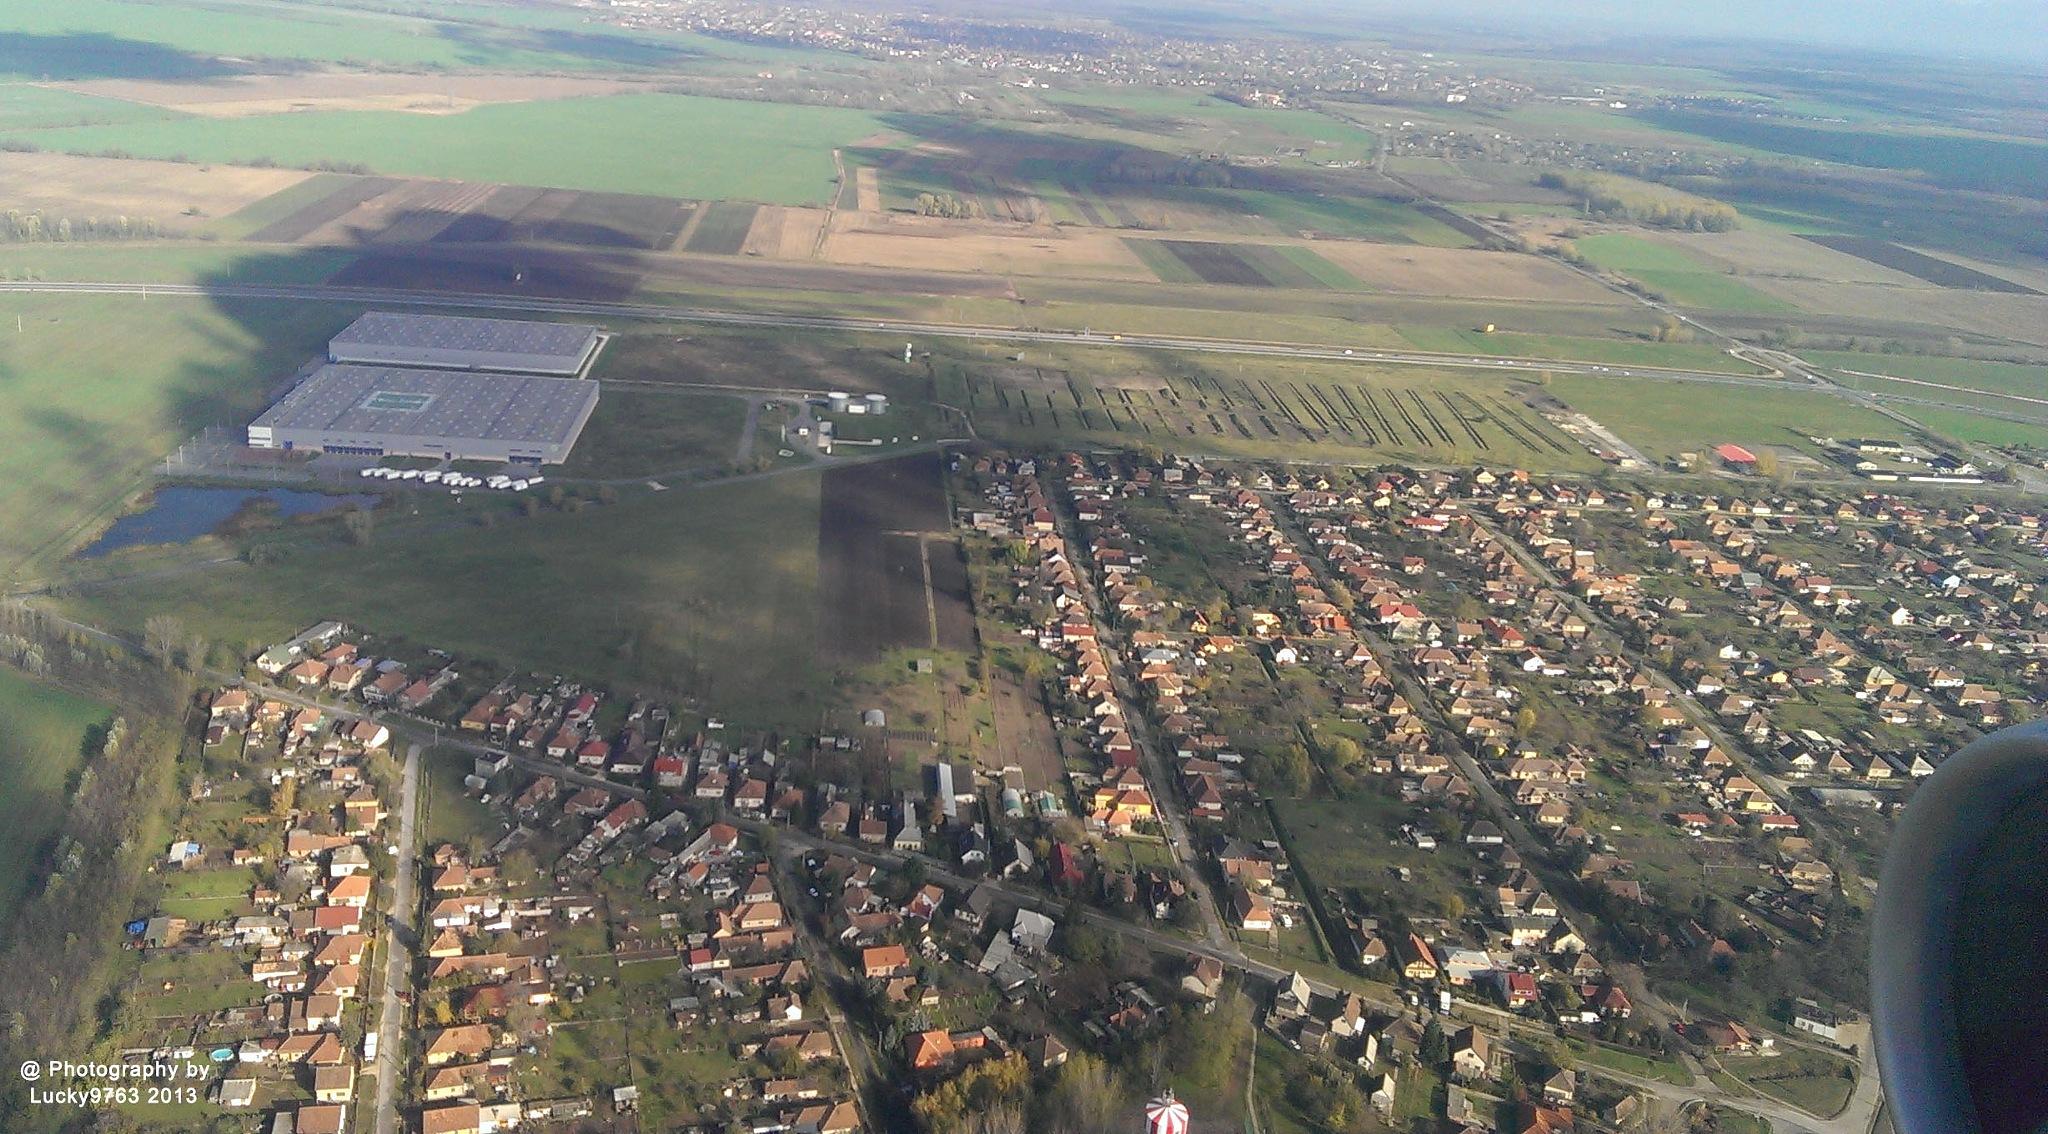 Above Hungary 2013 by Attila Erdei